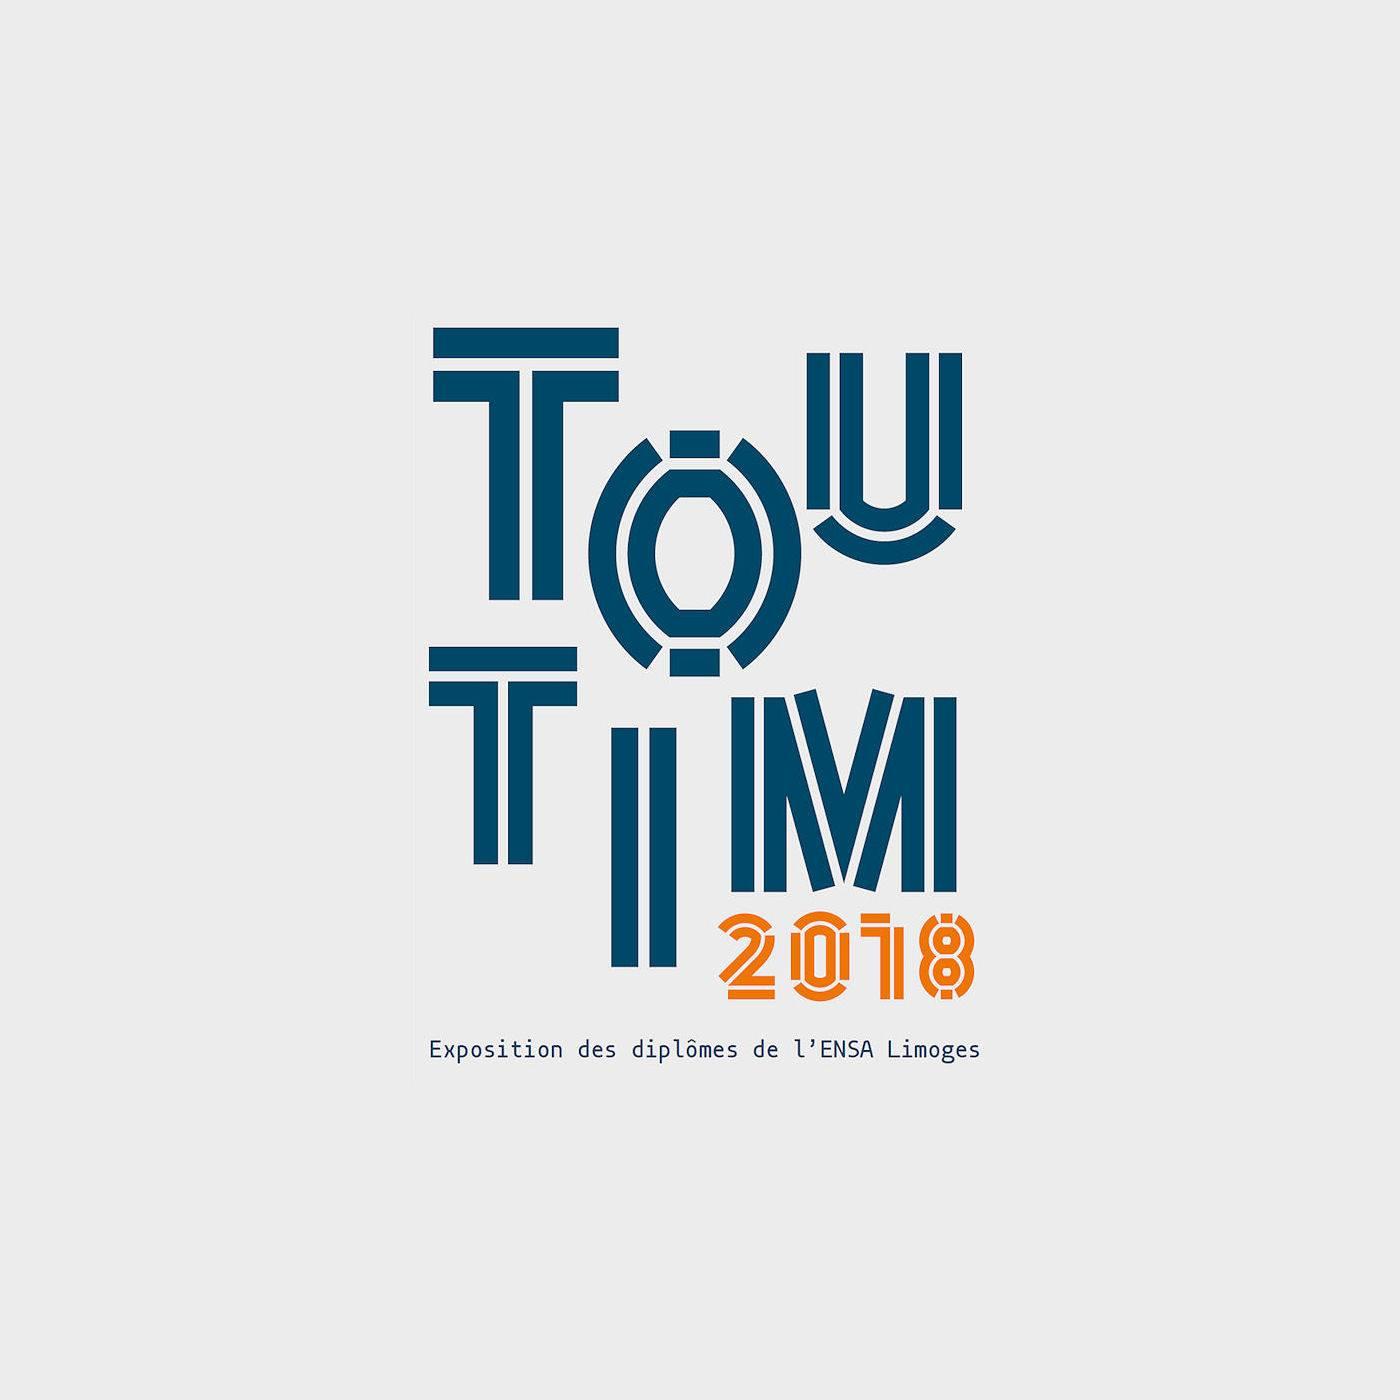 TOUTIM 2018 - ENSA Limoges